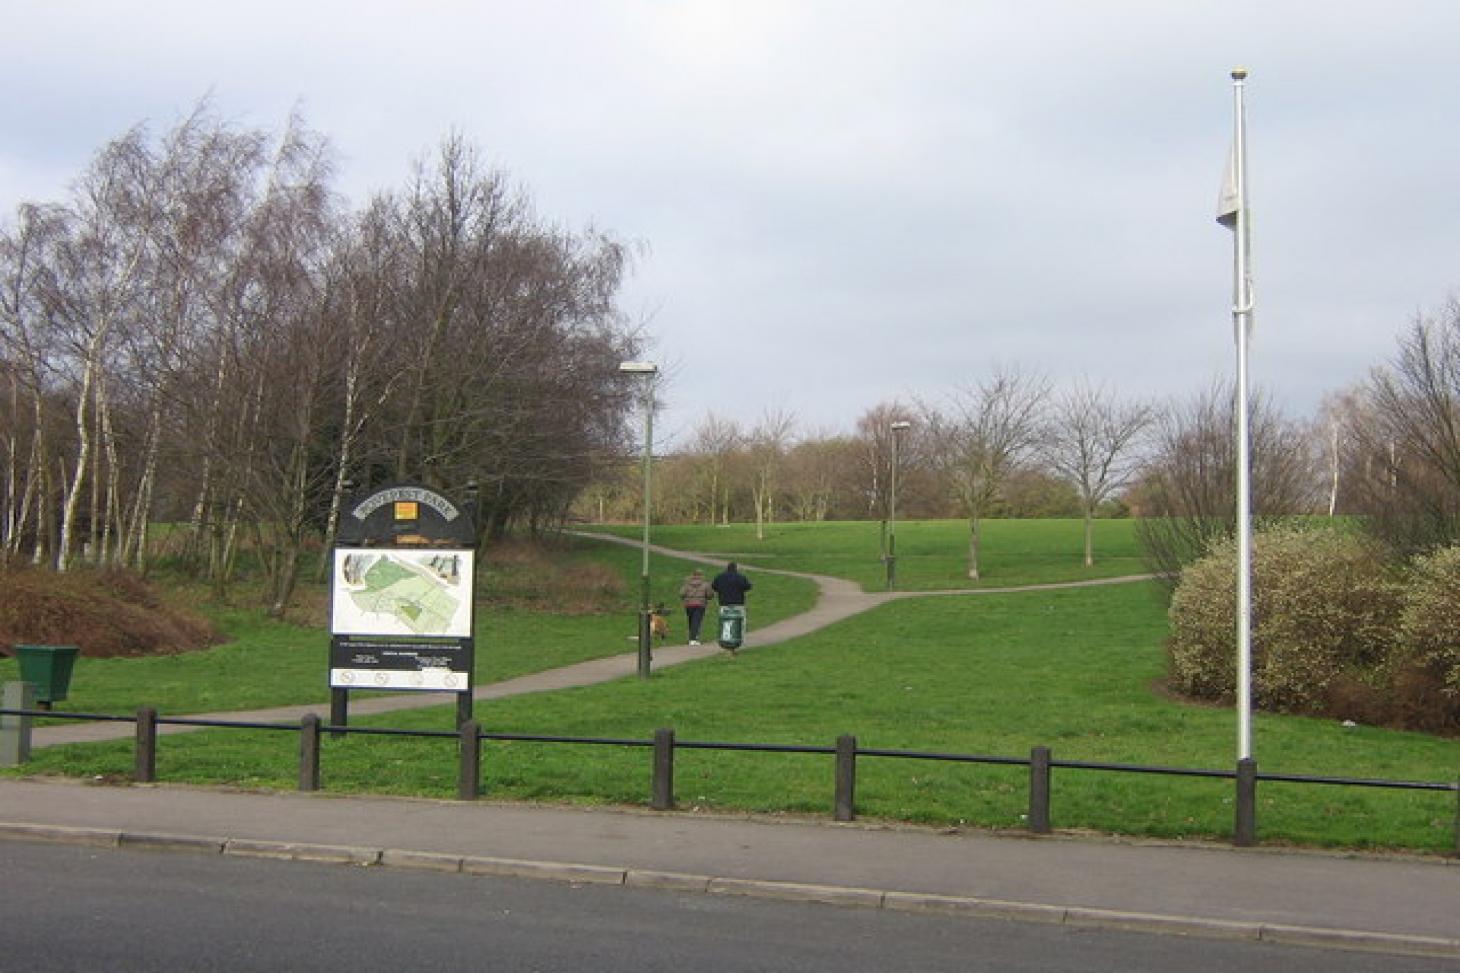 Poverest Park 11 a side   Grass football pitch